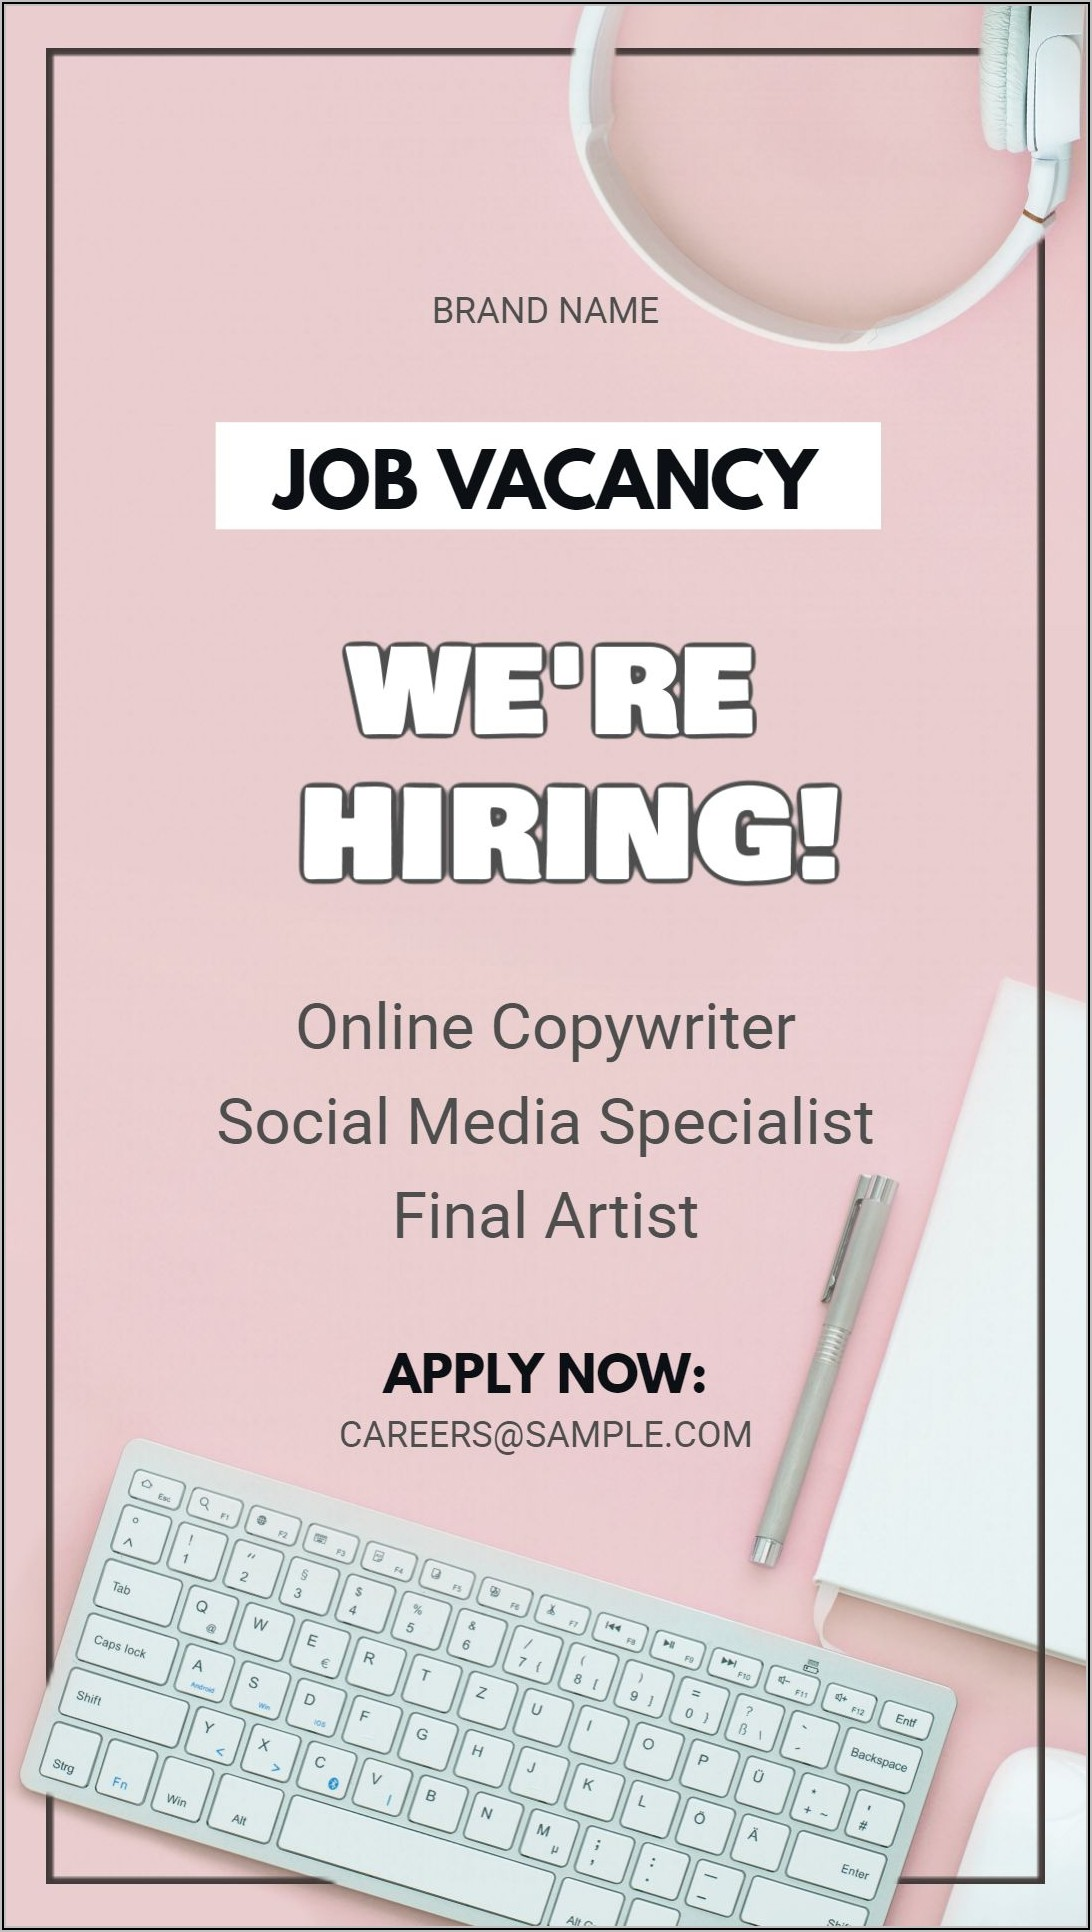 Job Vacancy Ad Template